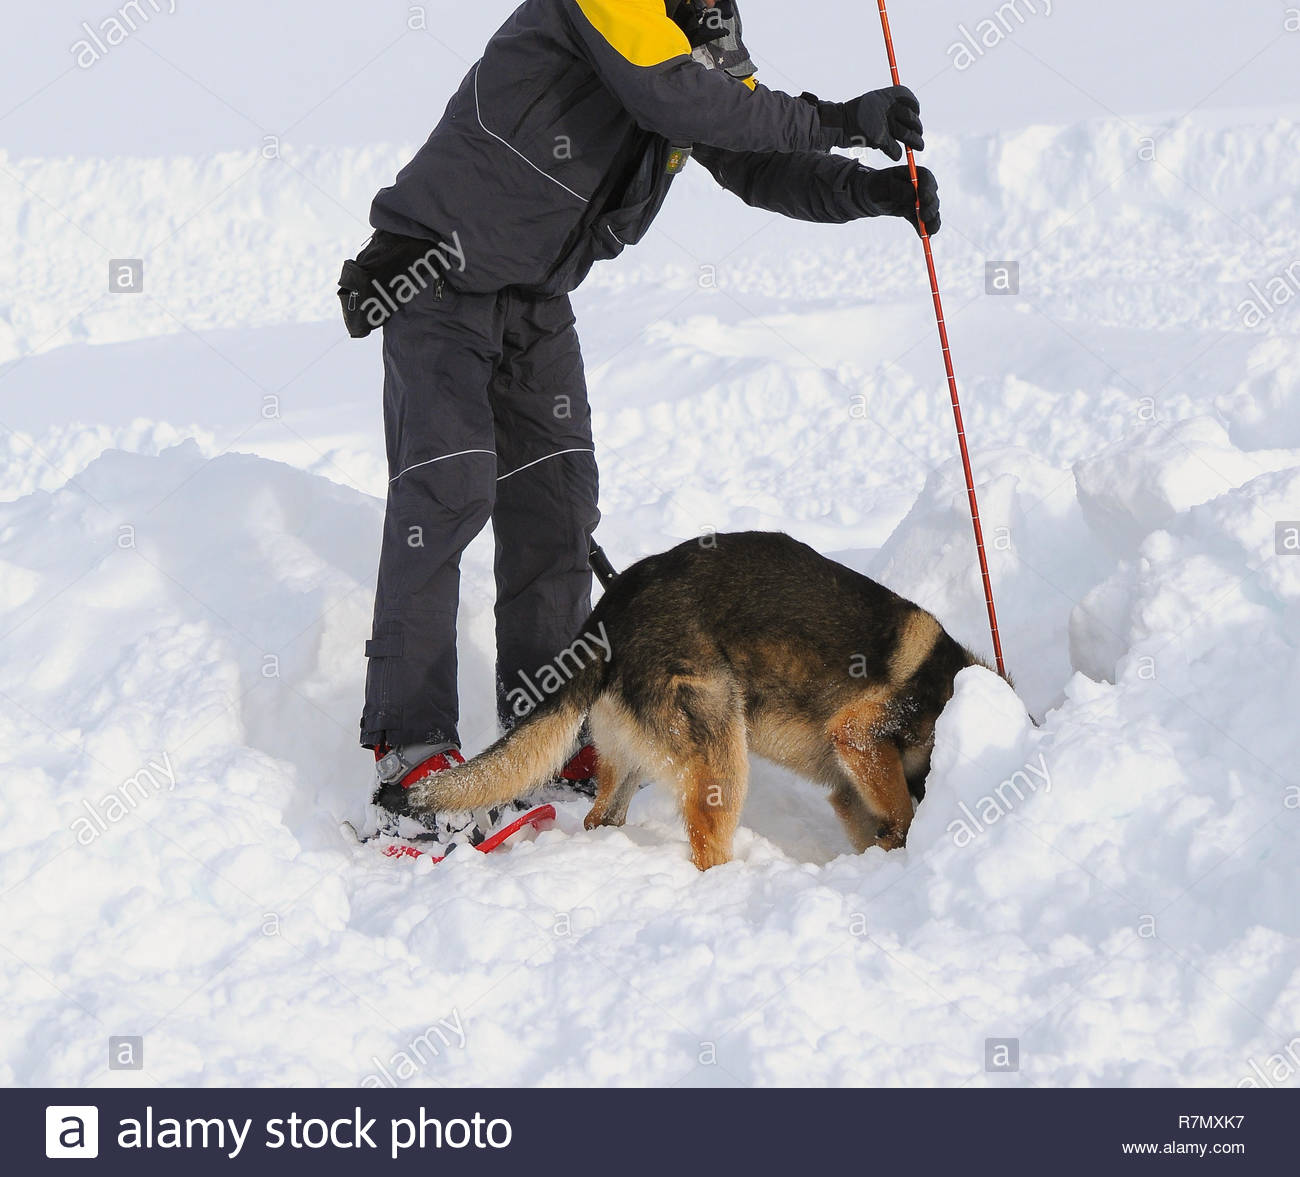 German shepherd dog rescue dog on snow. - Stock Image